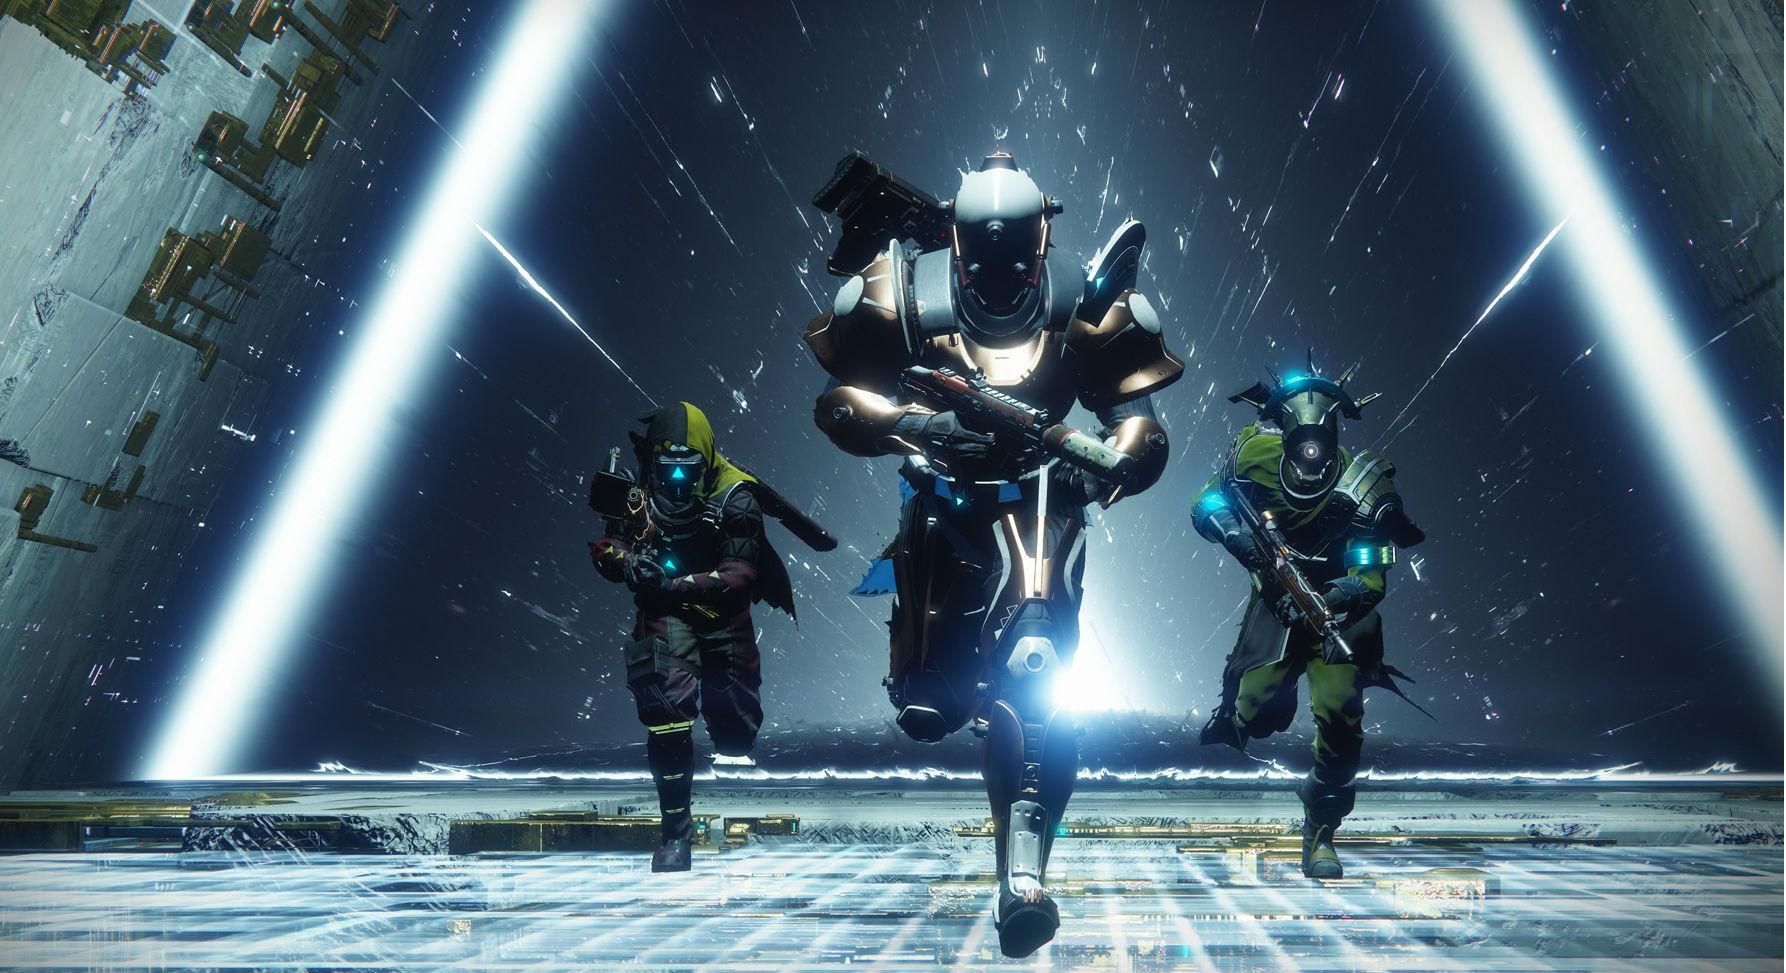 Destiny 2 to rework Nightfall Strikes, removing timer and adding